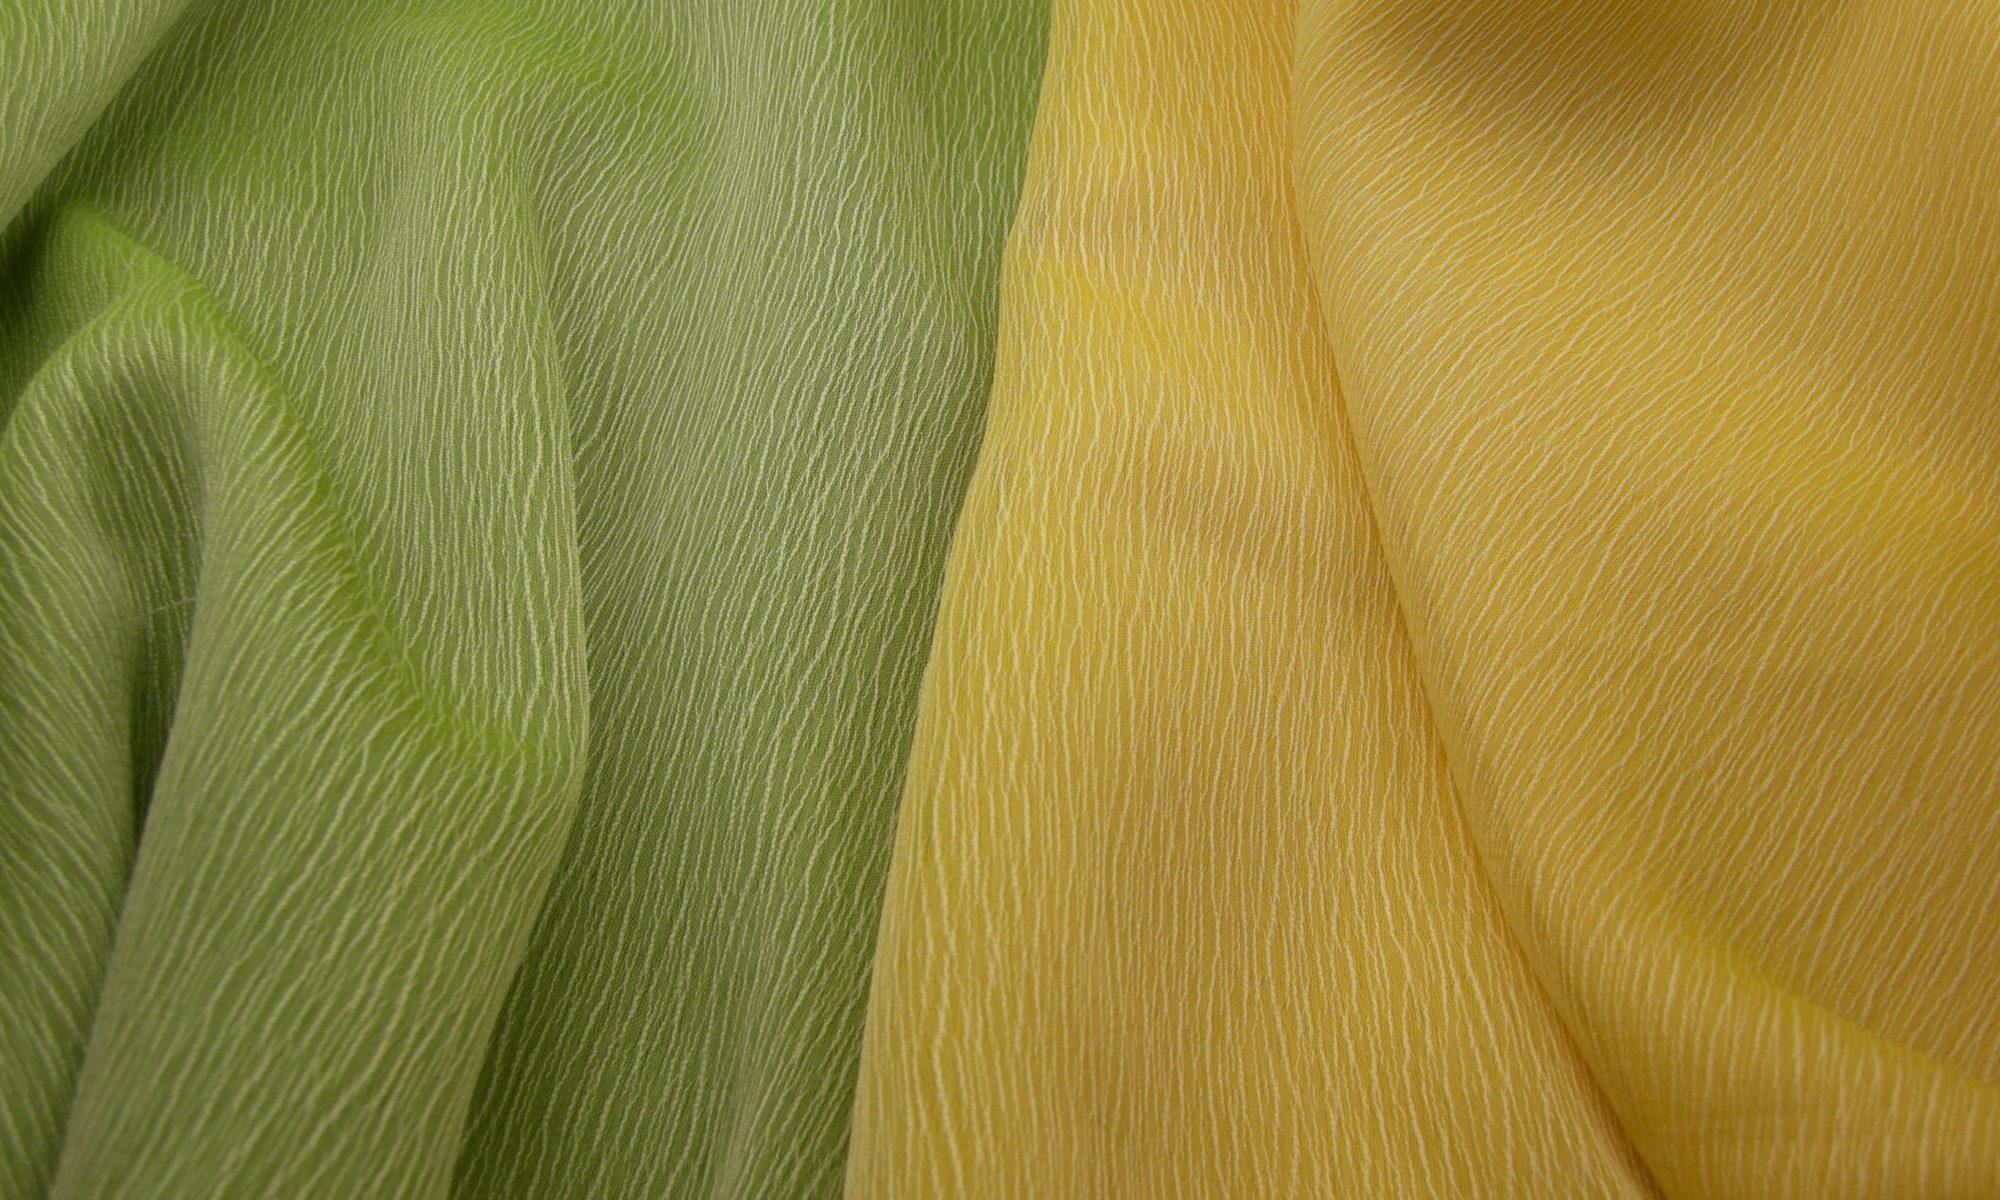 ART 7150 Transparent crepe chiffon shirt fabric WIDTH cm145 WEIGHT gr90 COMPOSITION 100 polyester - Green 400mts – Yellow 300mts